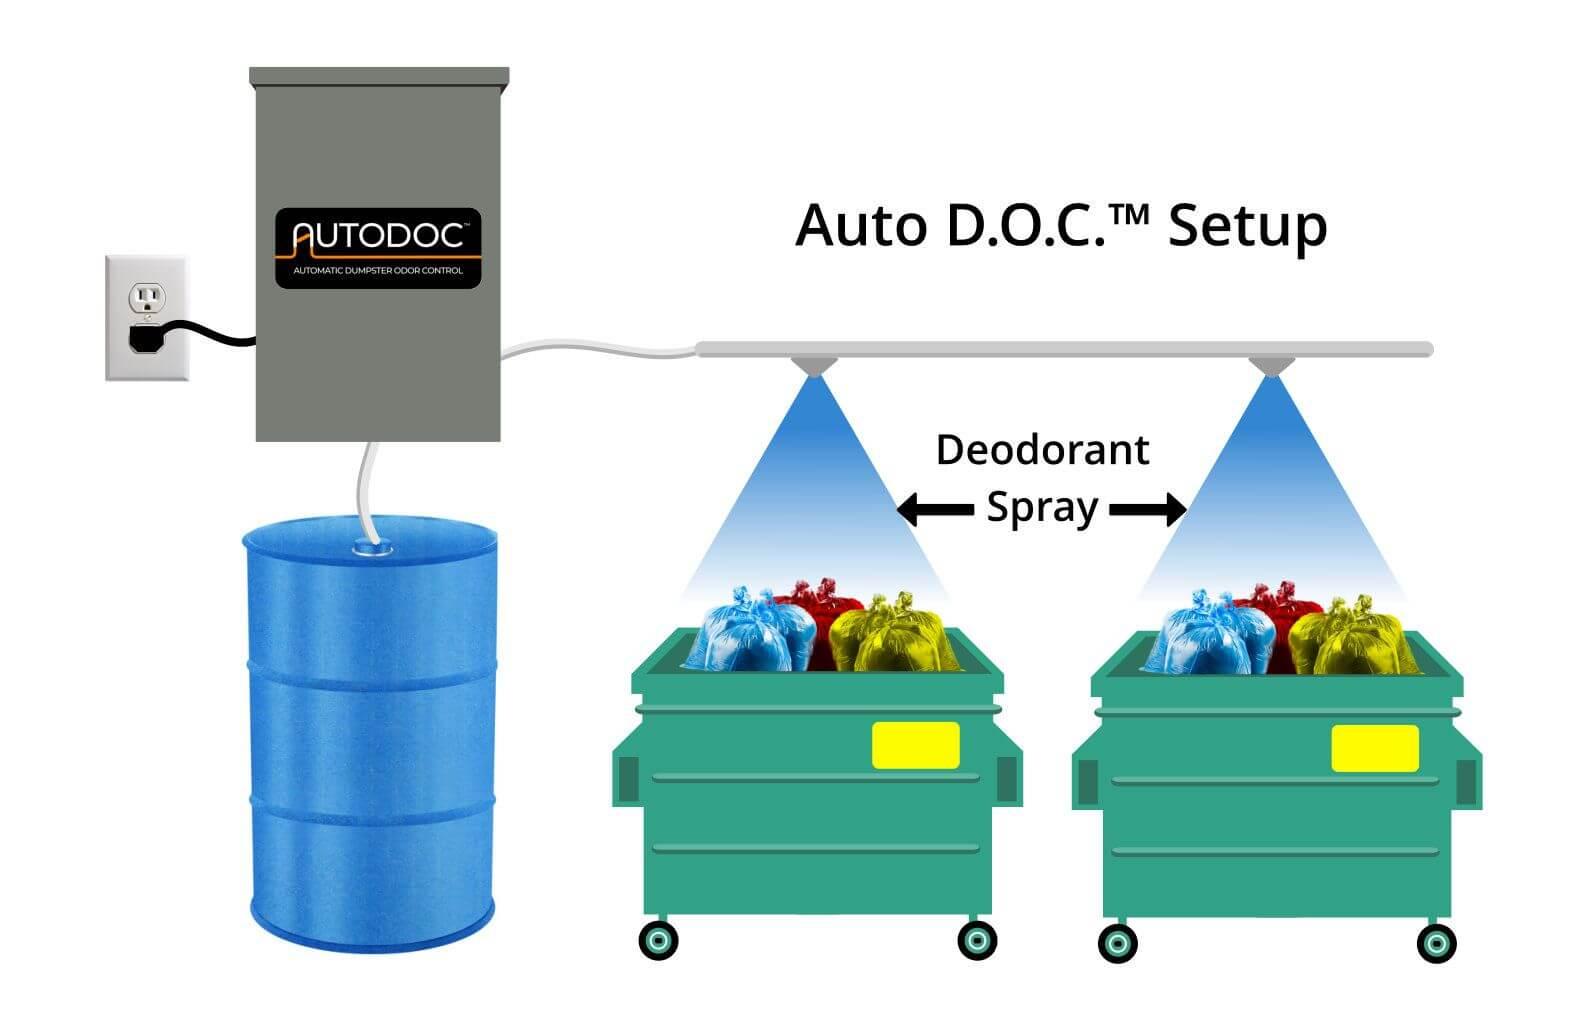 Dumpster Trash Room Spray Odor Control System